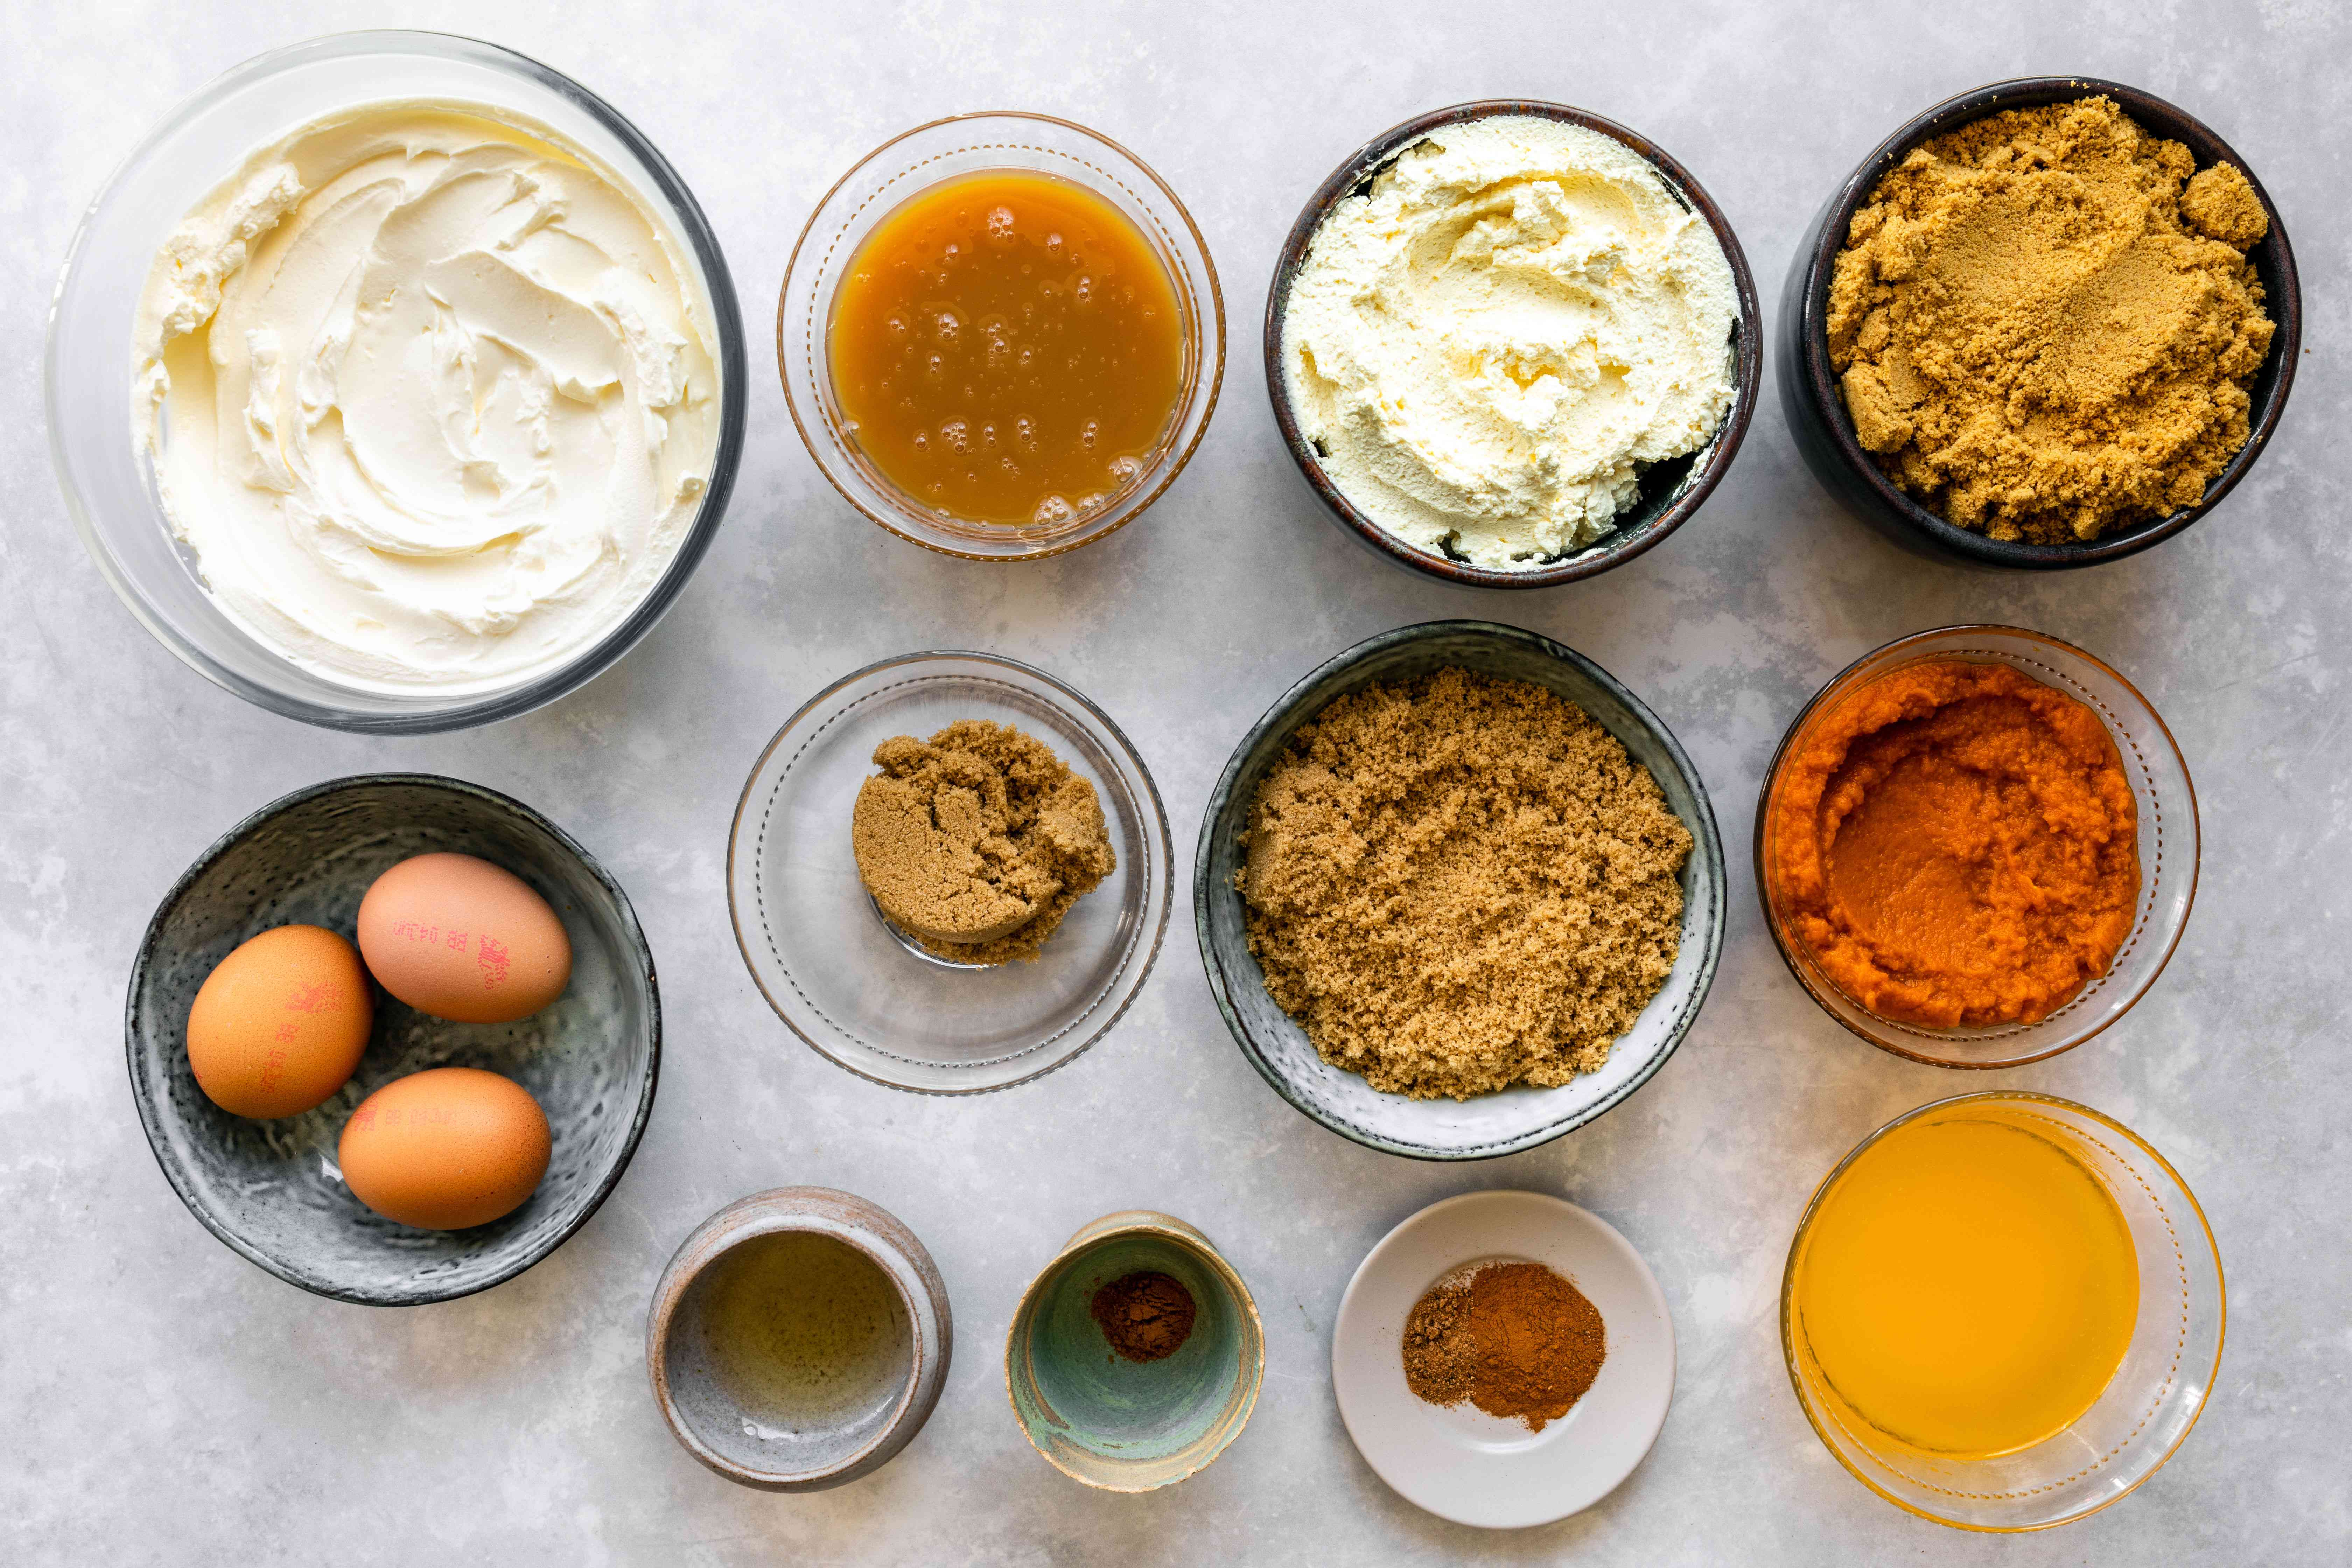 Ingredients for pumpkin cheesecake